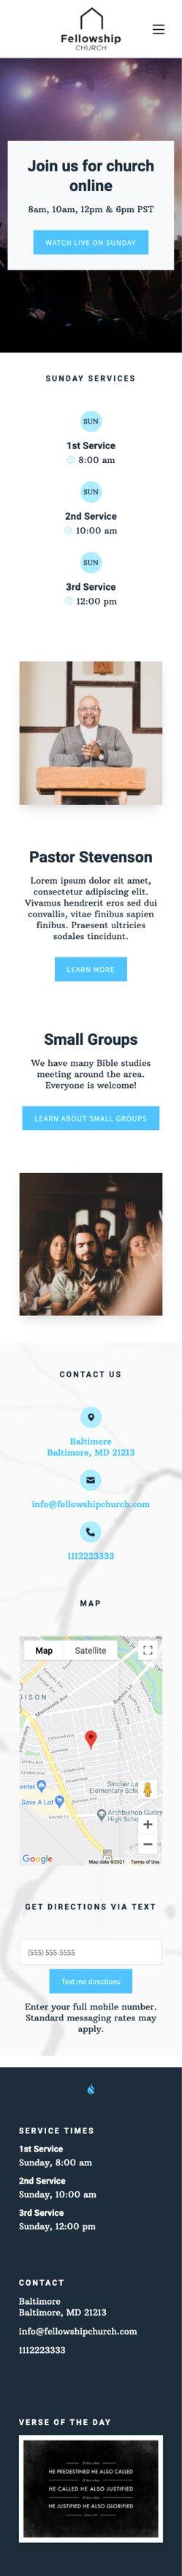 Fellowship Theme Screen Shot